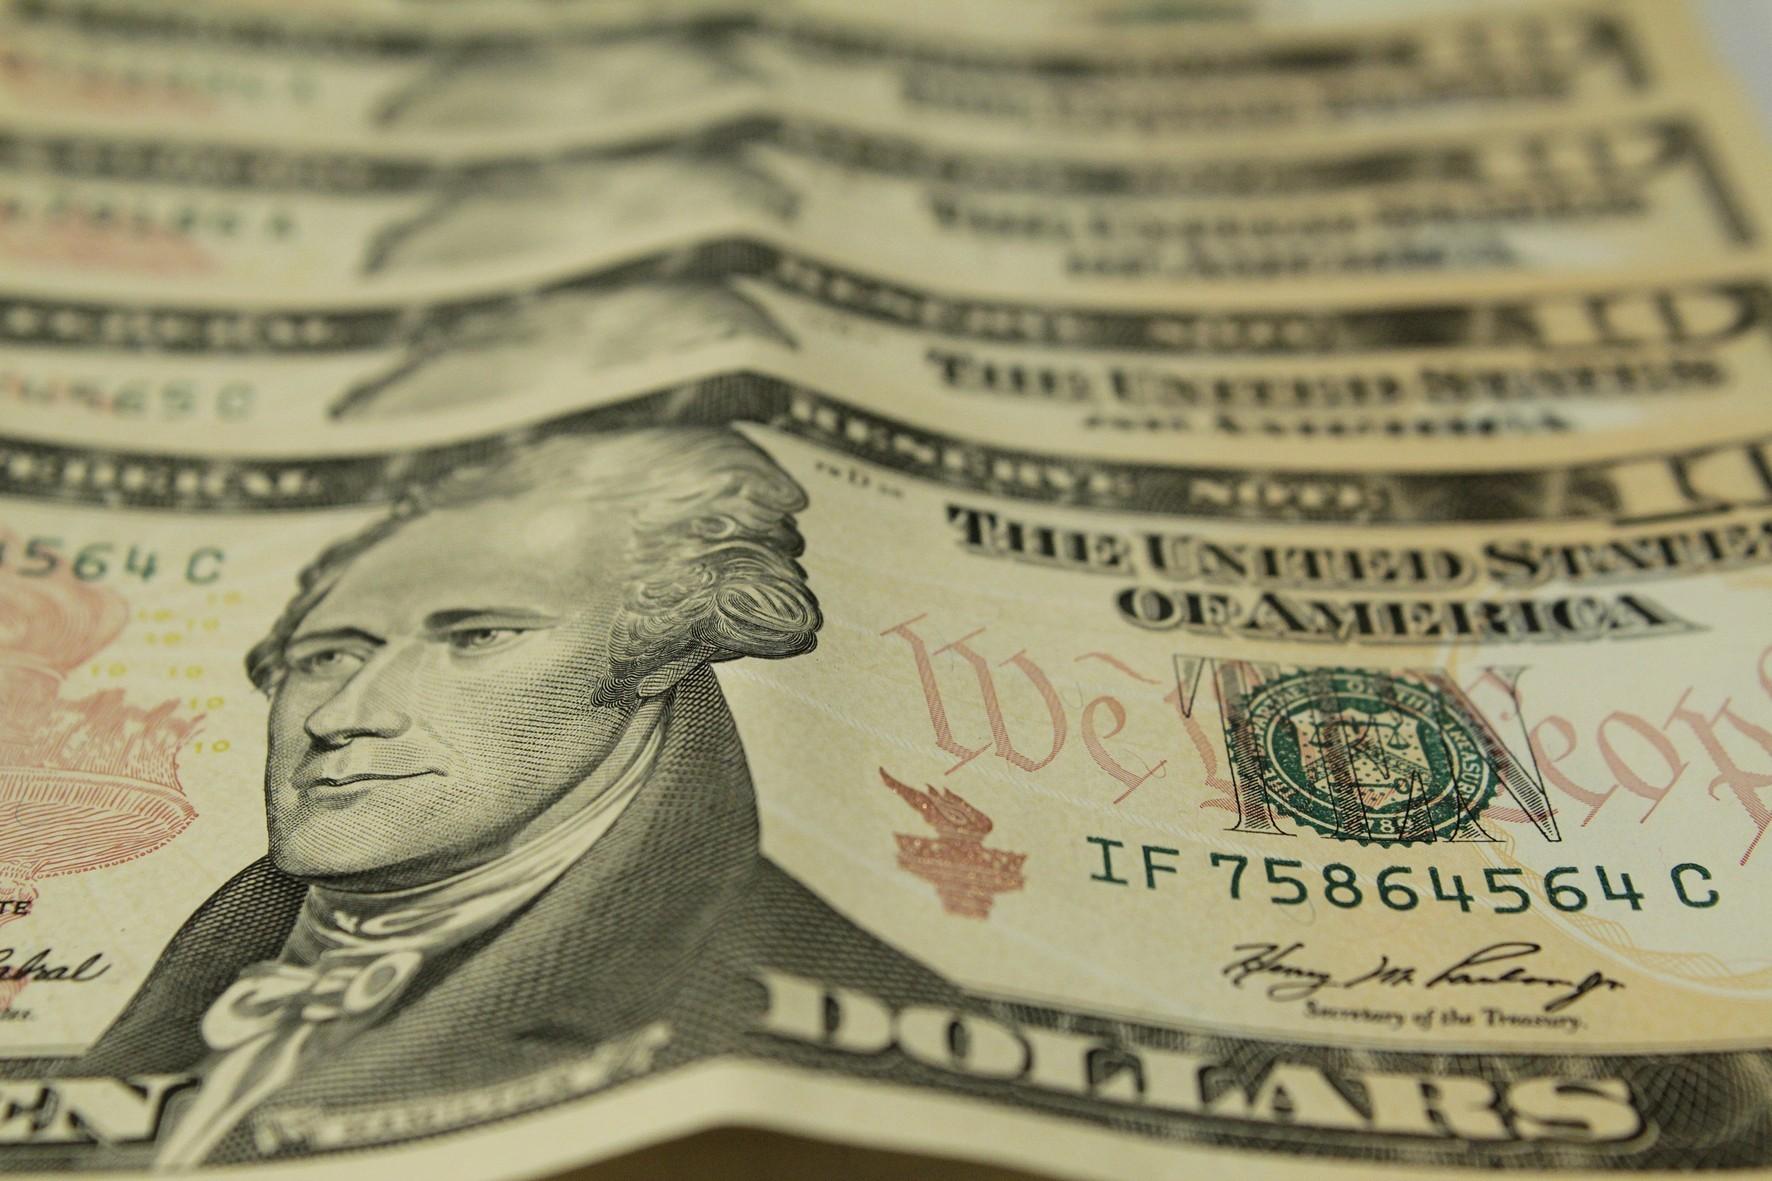 Dólar. Foto: Marcos Santos/USP Imagens